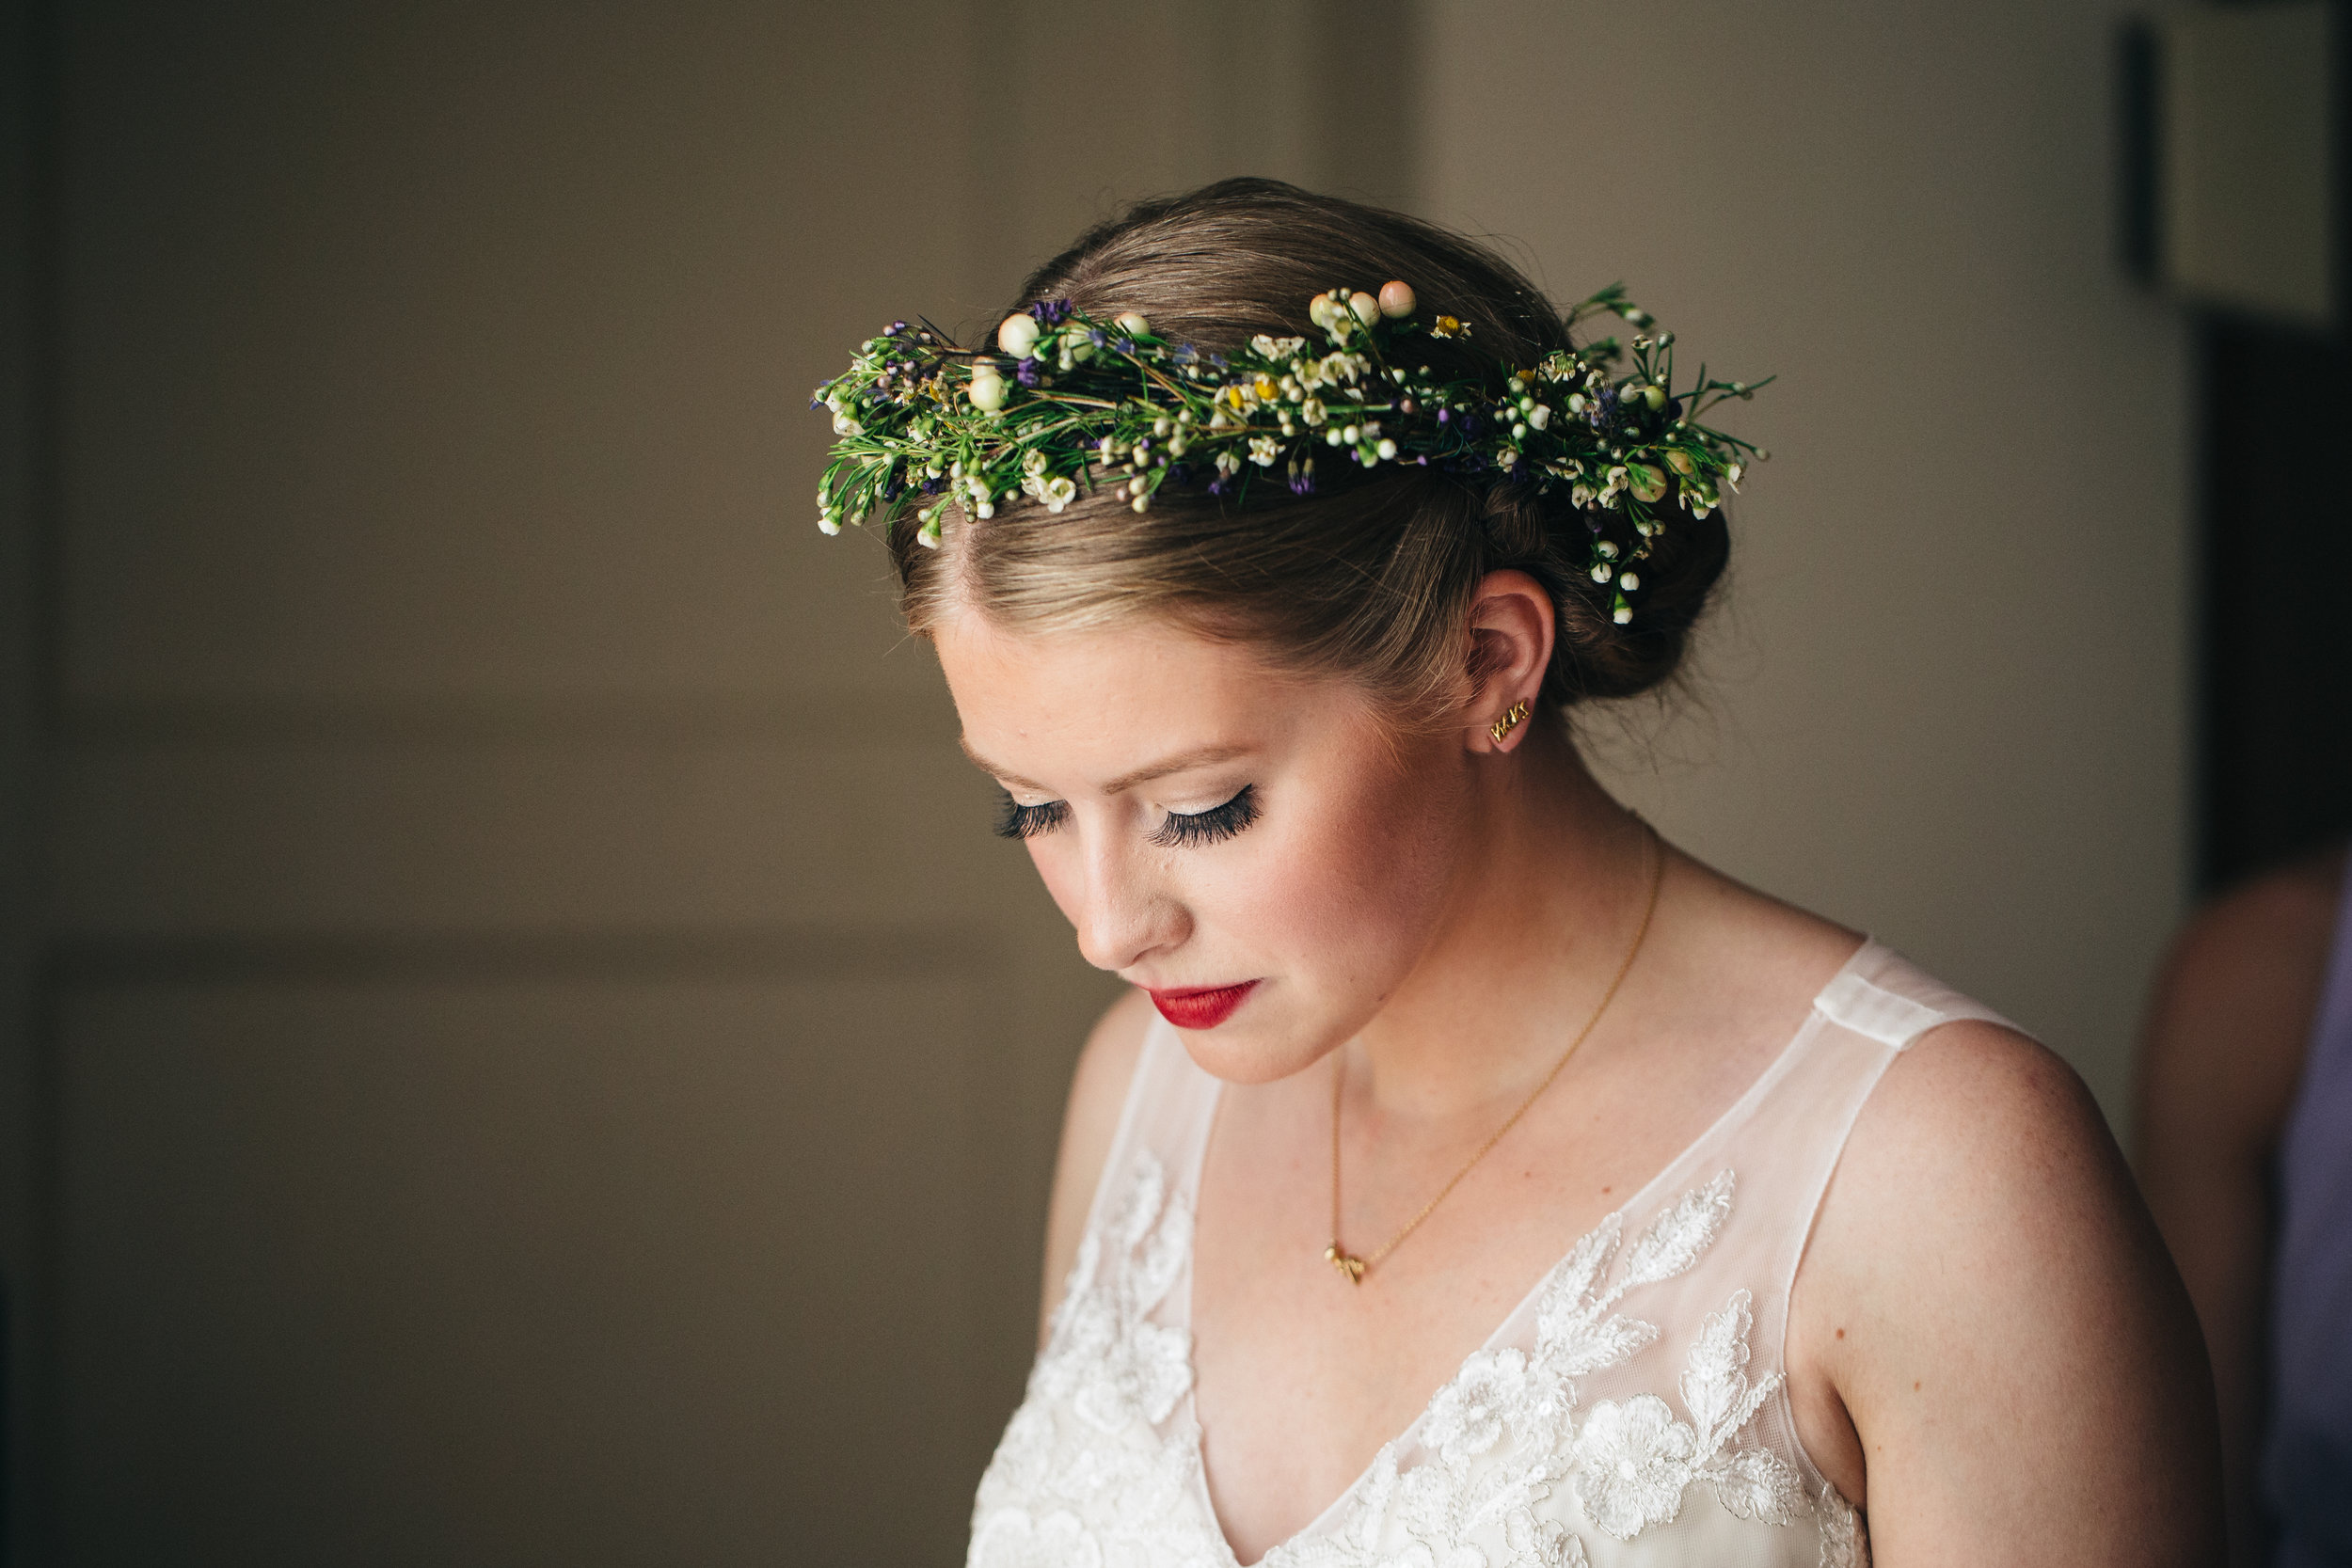 Bride in a floral crown